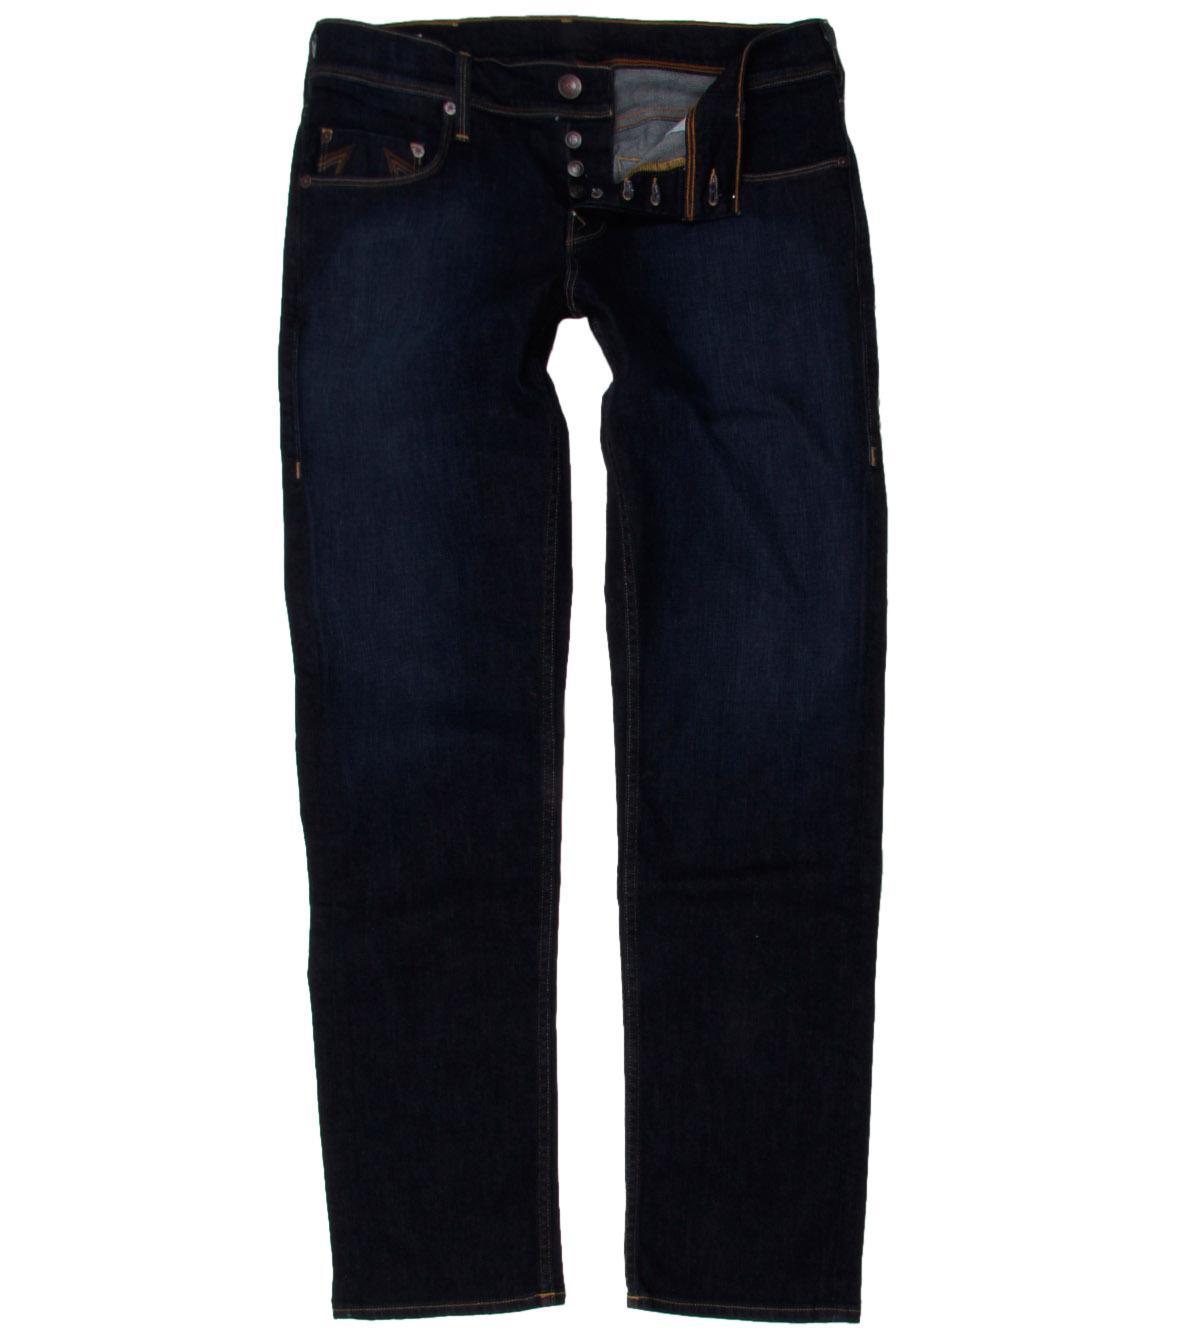 foto true religion ricky negro jeans pierna recta foto 368493. Black Bedroom Furniture Sets. Home Design Ideas